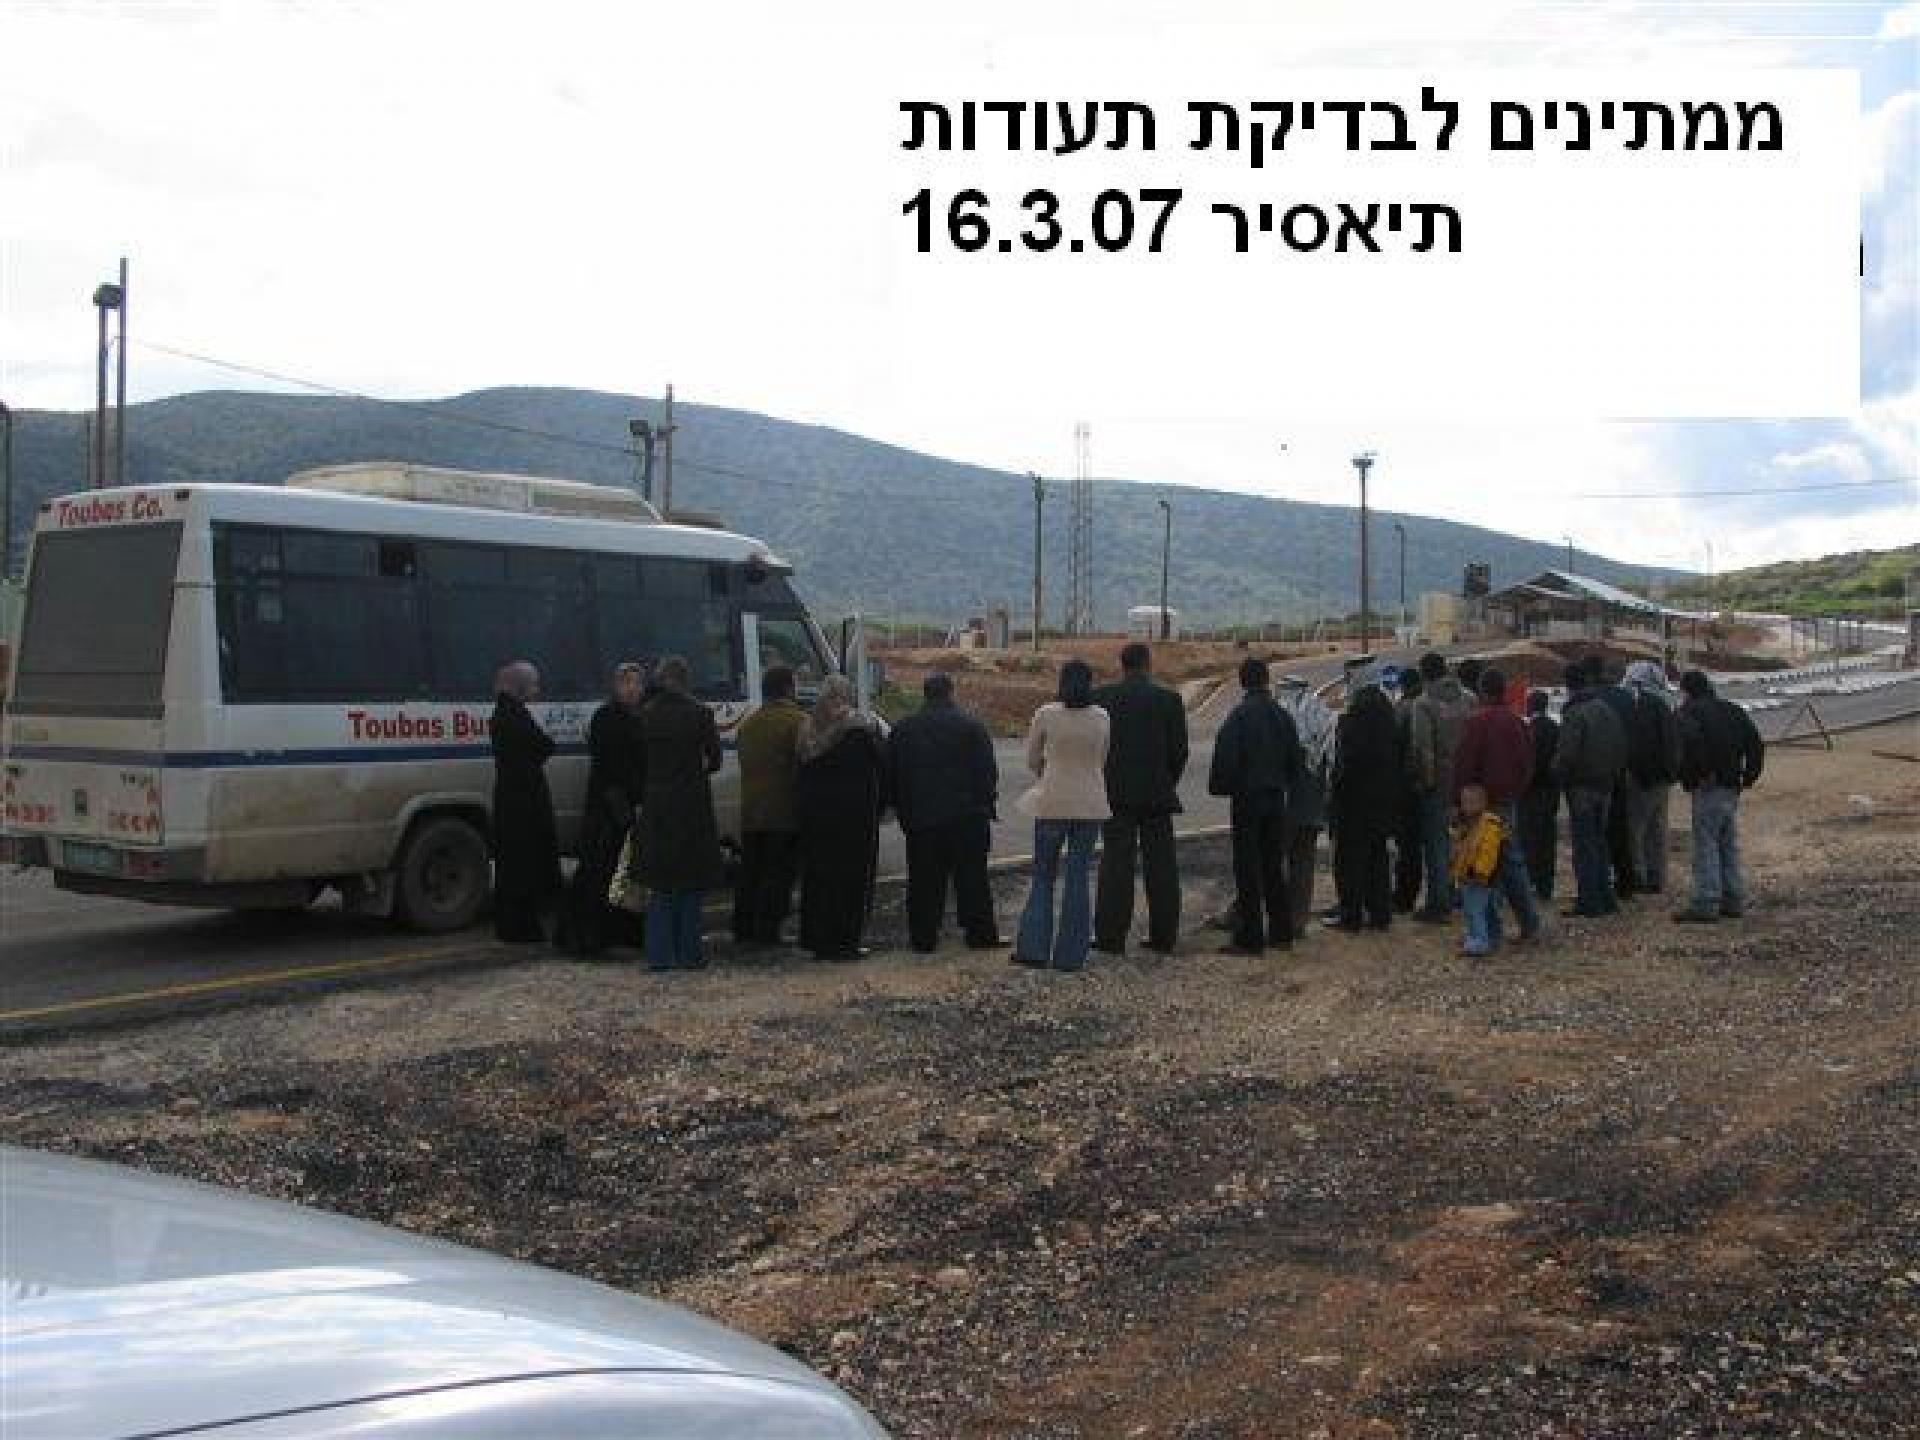 Tayasir checkpoint 16.03.07